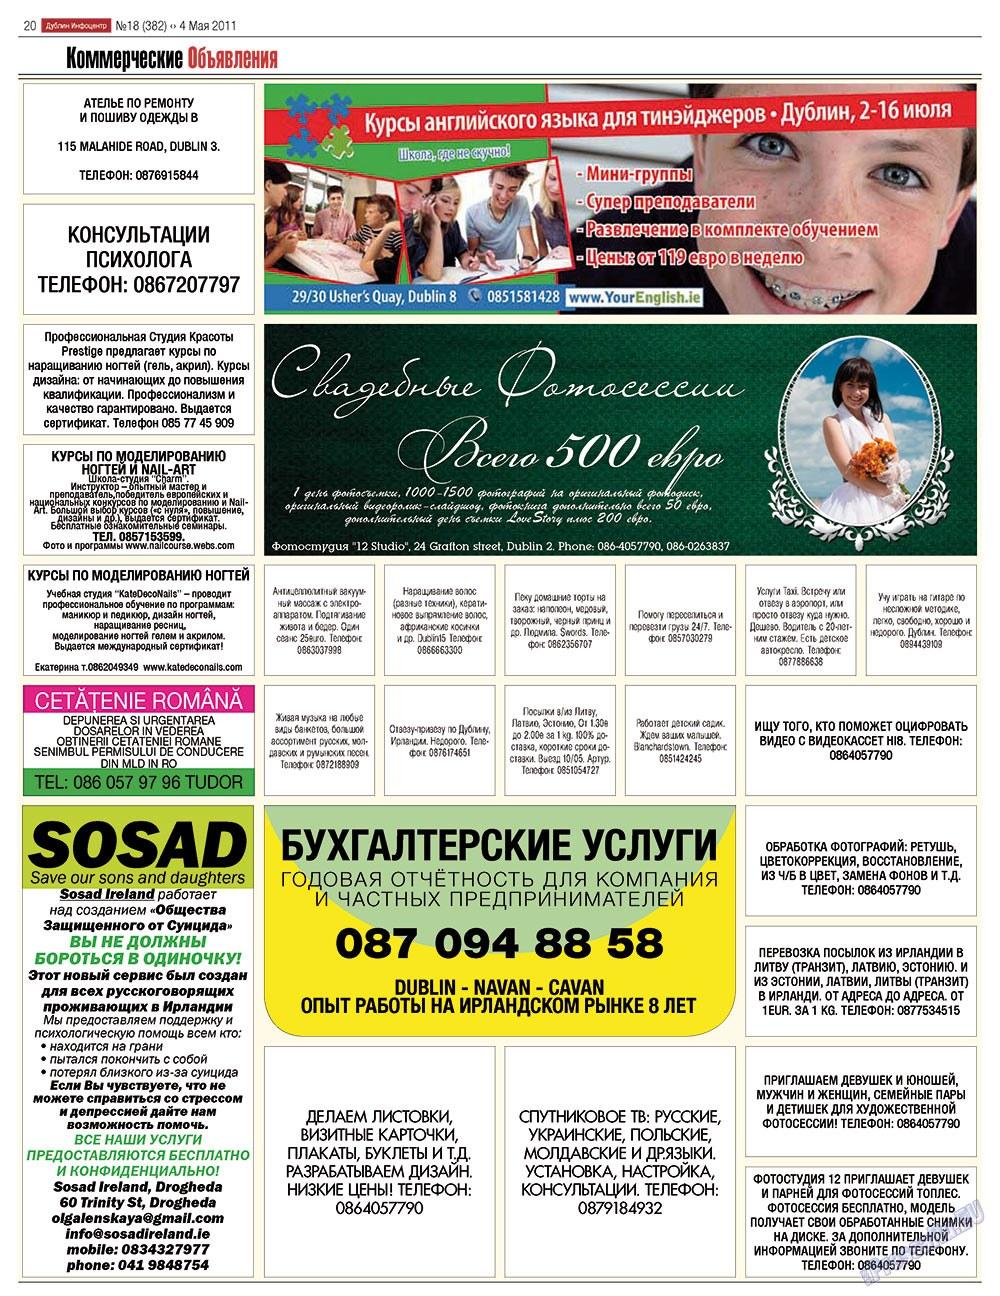 Дублин инфоцентр (газета). 2011 год, номер 18, стр. 20